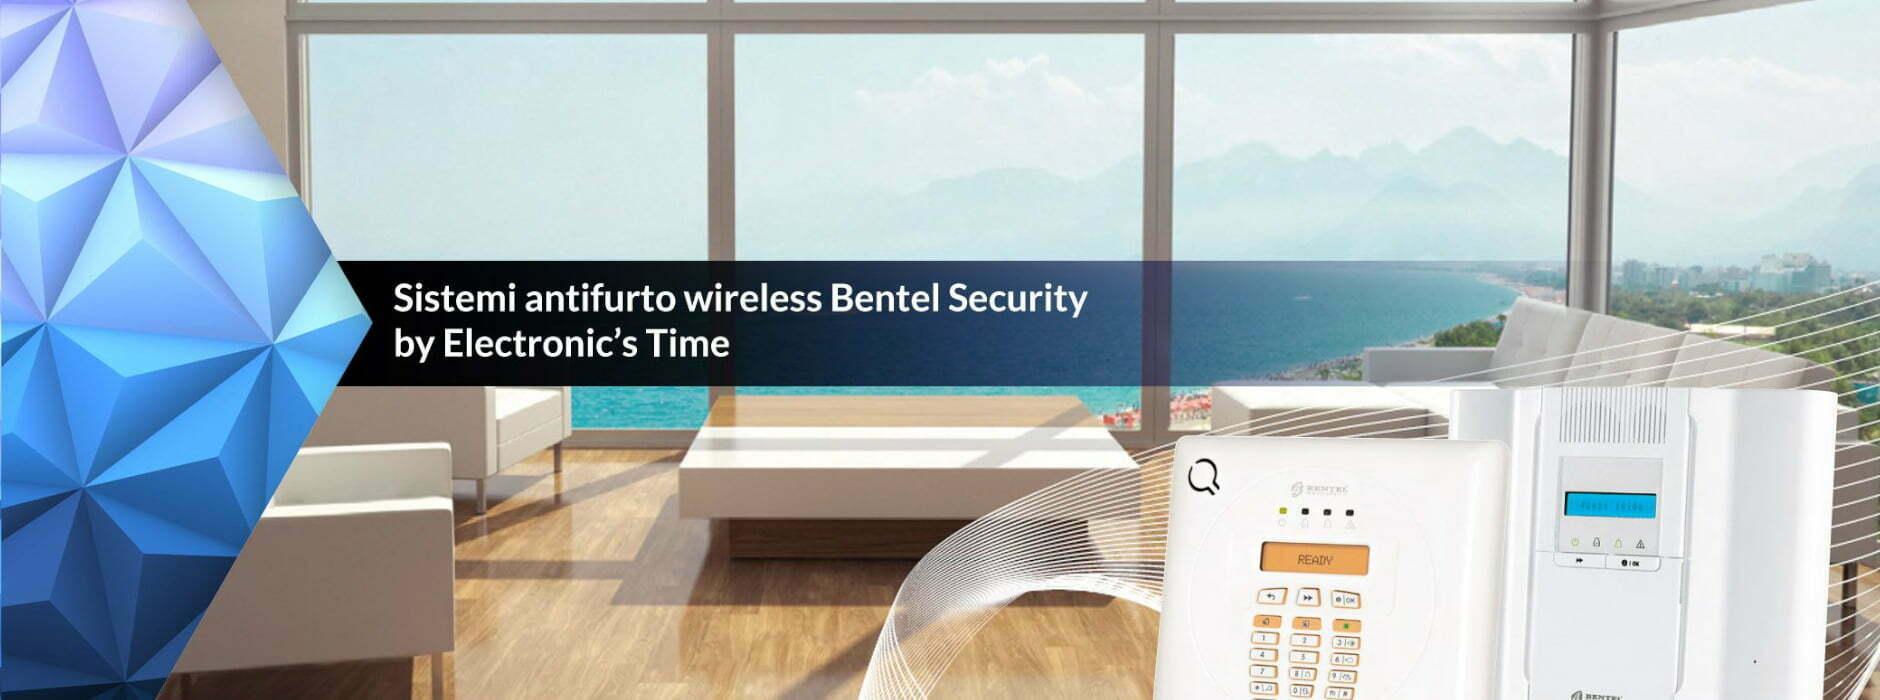 bentel-bw-electronics-time-news-home